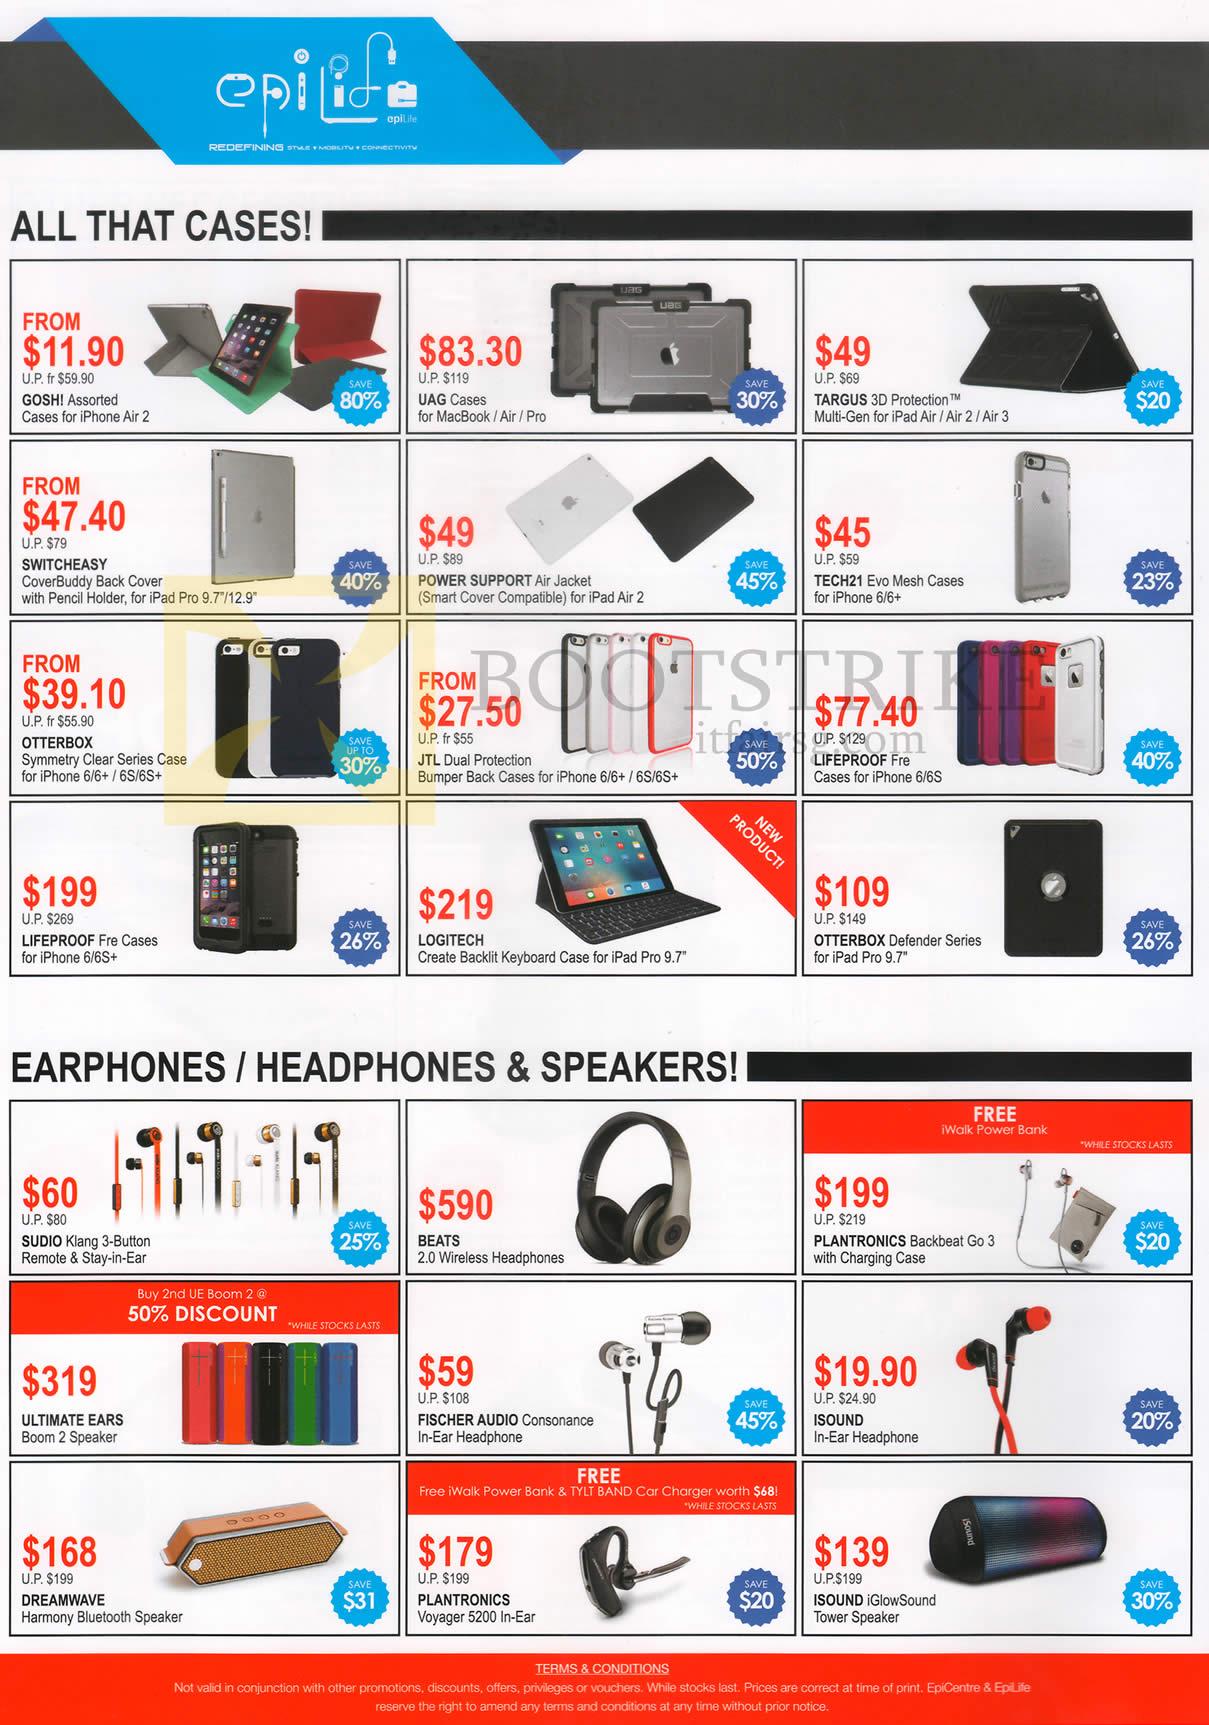 COMEX 2016 price list image brochure of EpiCentre Cases, Earphones, Headphones, Speakers, Gosh, UAG, Targus, Tech21, Otterbox, Lifeproof, JTL, Logitech, Studio, Beats, Plantronics, ISound